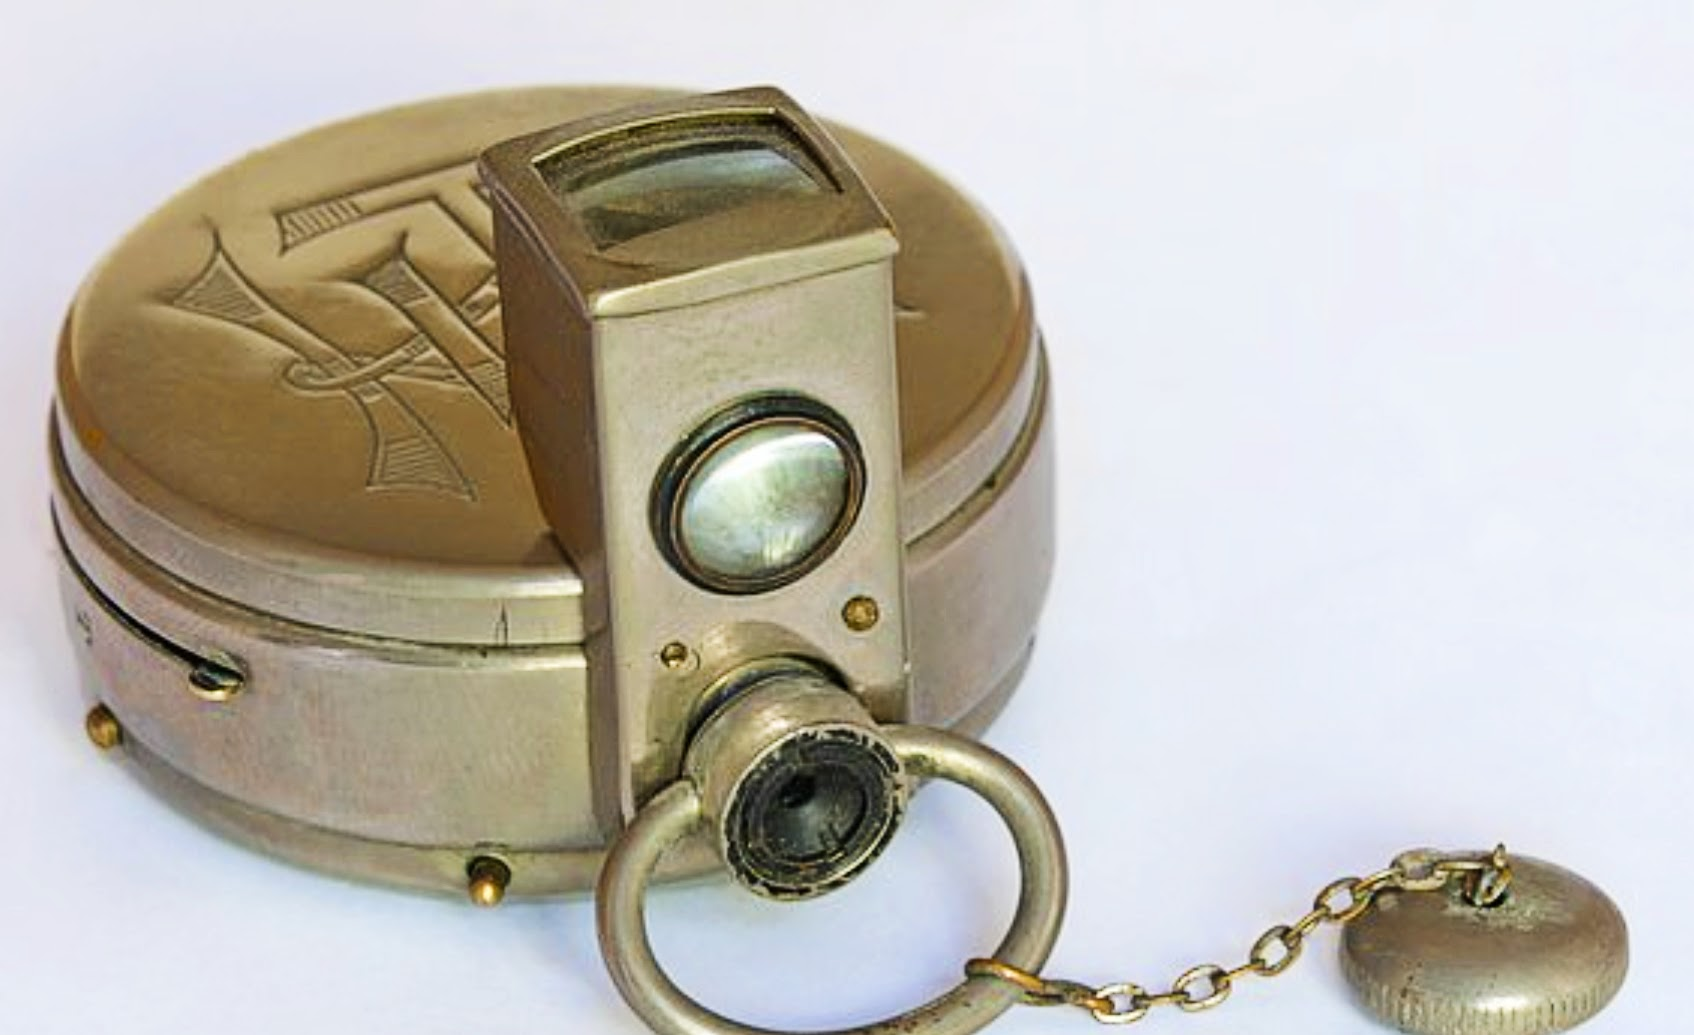 Miniature cameras were hidden in everyday devises